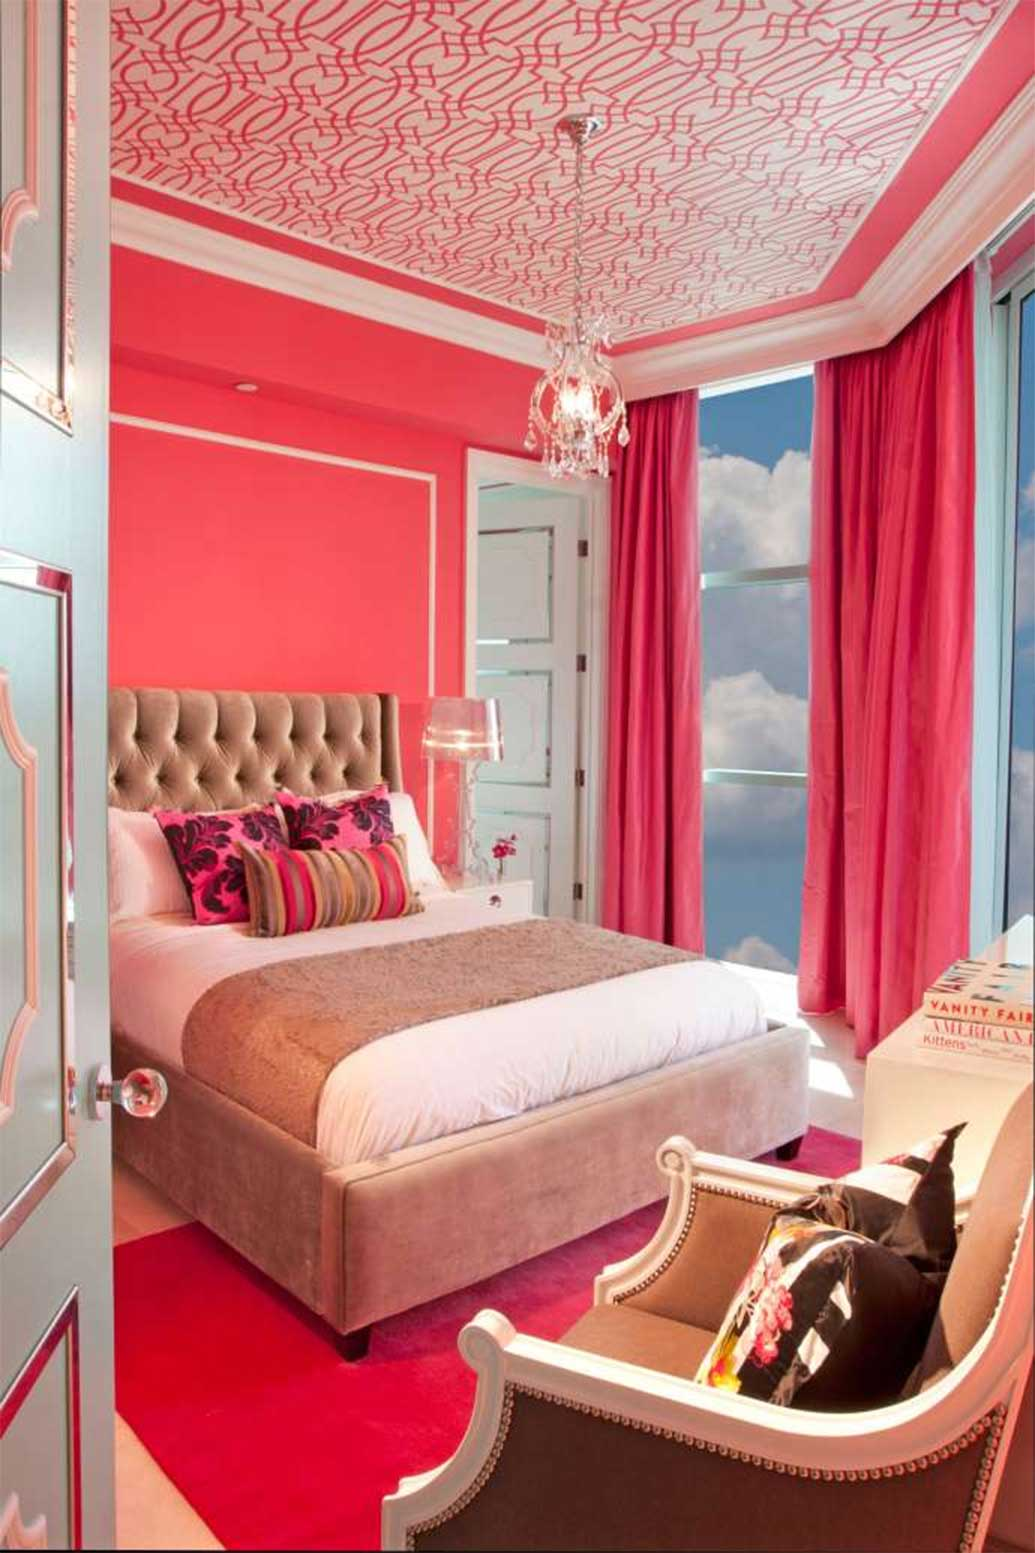 Transform your Miami Interior Design